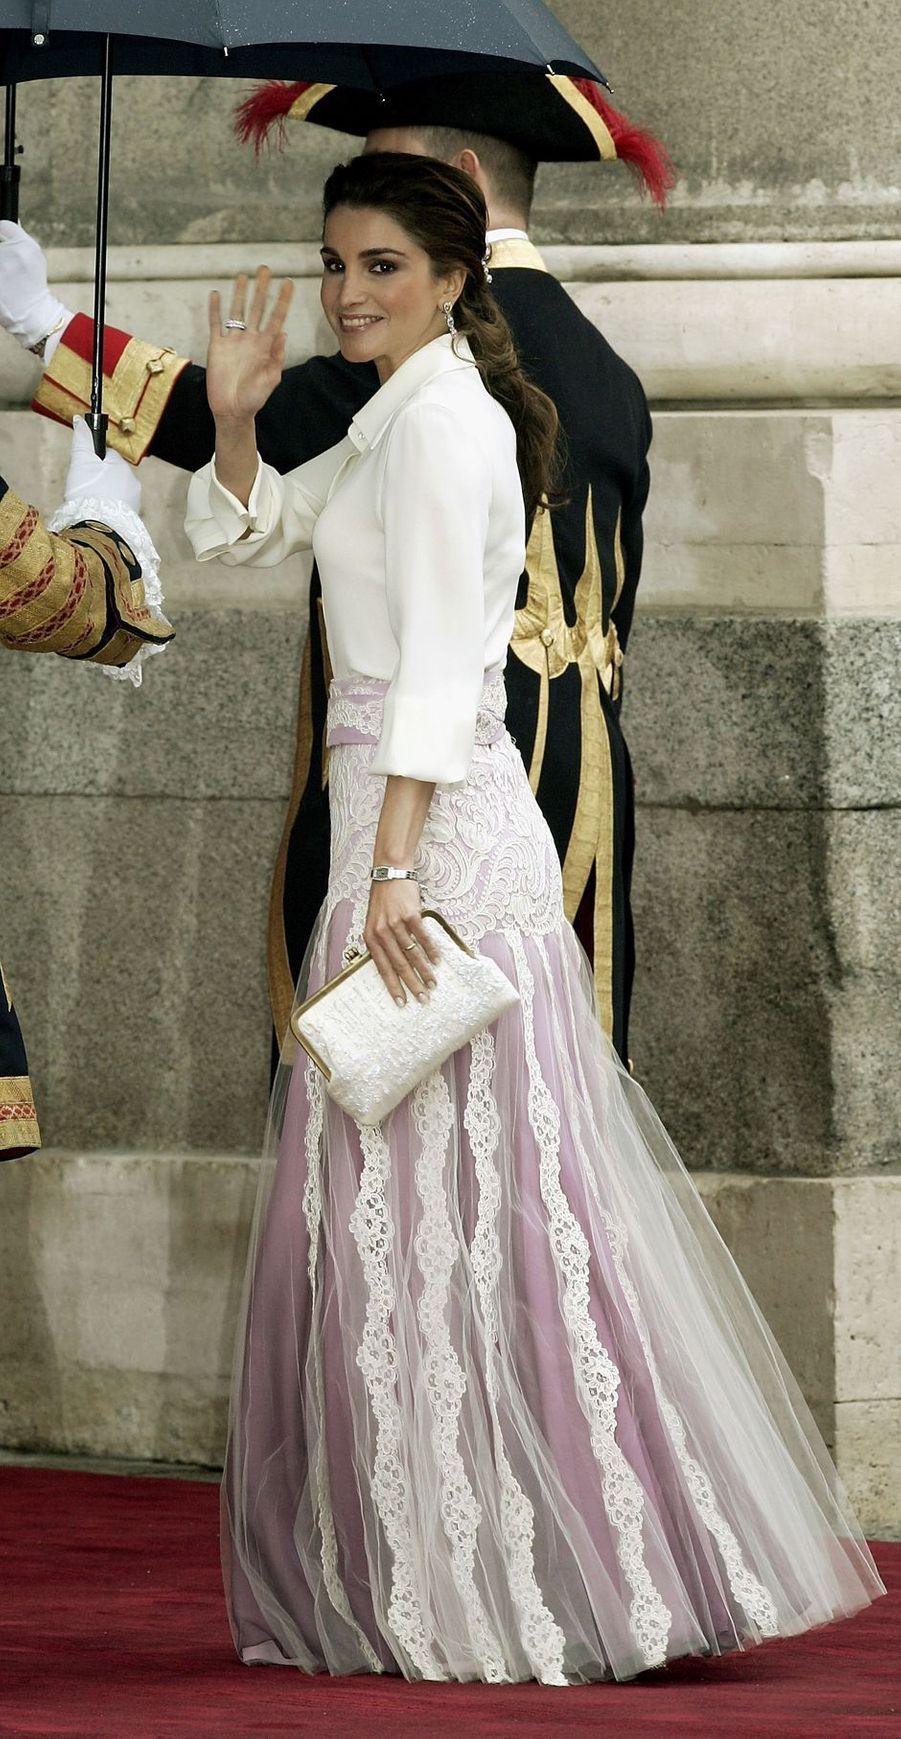 La reine Rania de Jordanie à Madrid, le 22 mai 2004